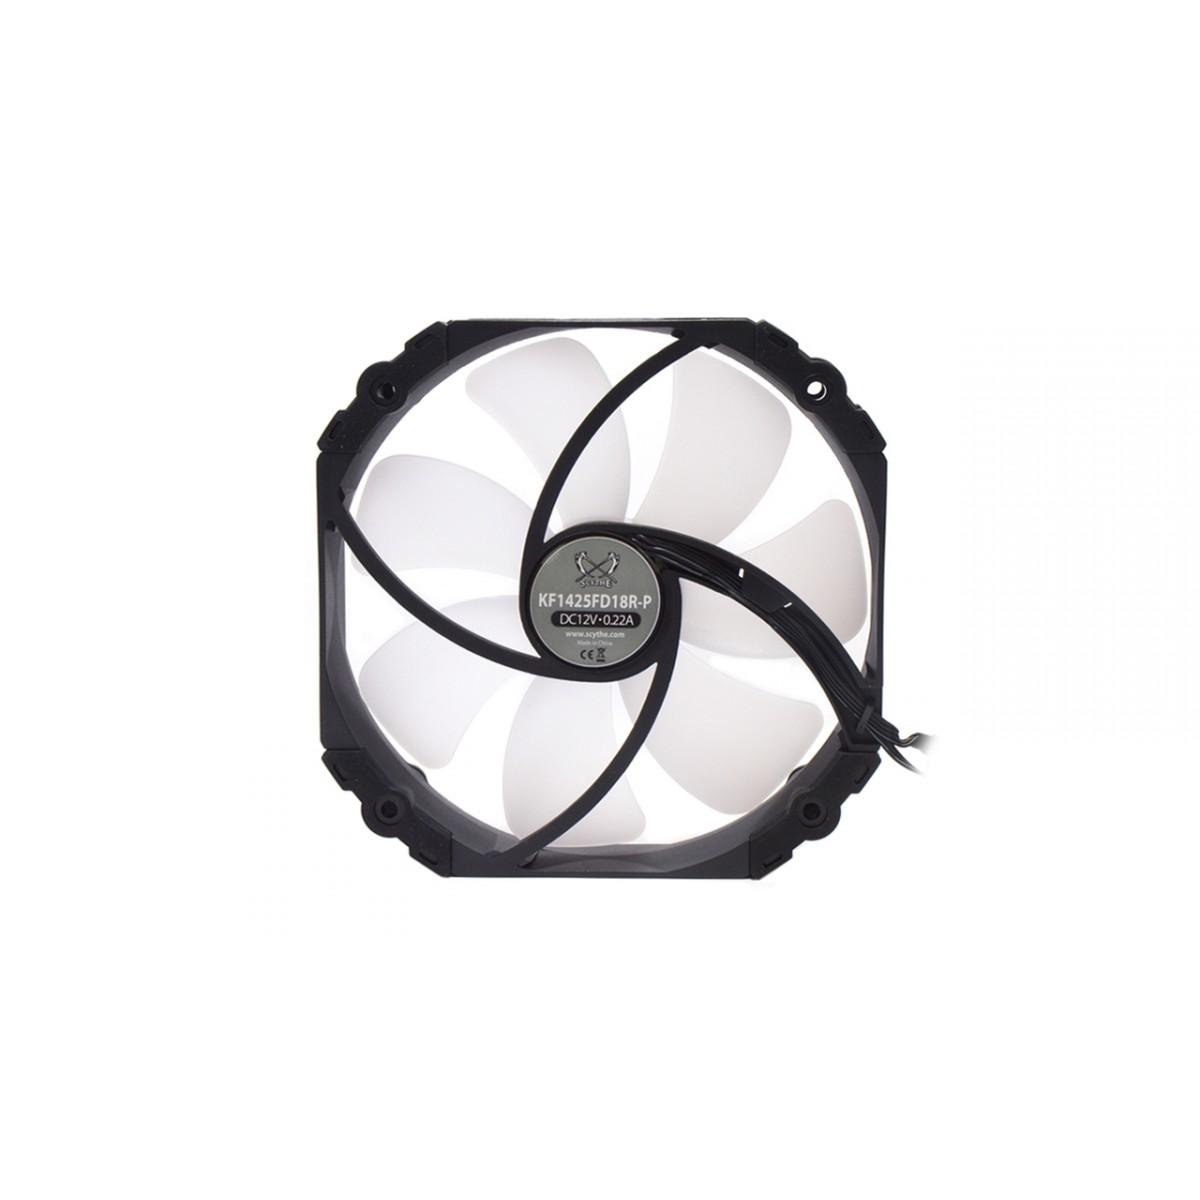 Cooler para Gabinete Scythe Kaze flex 140mm RGB PWM, KF1425FD18R-P